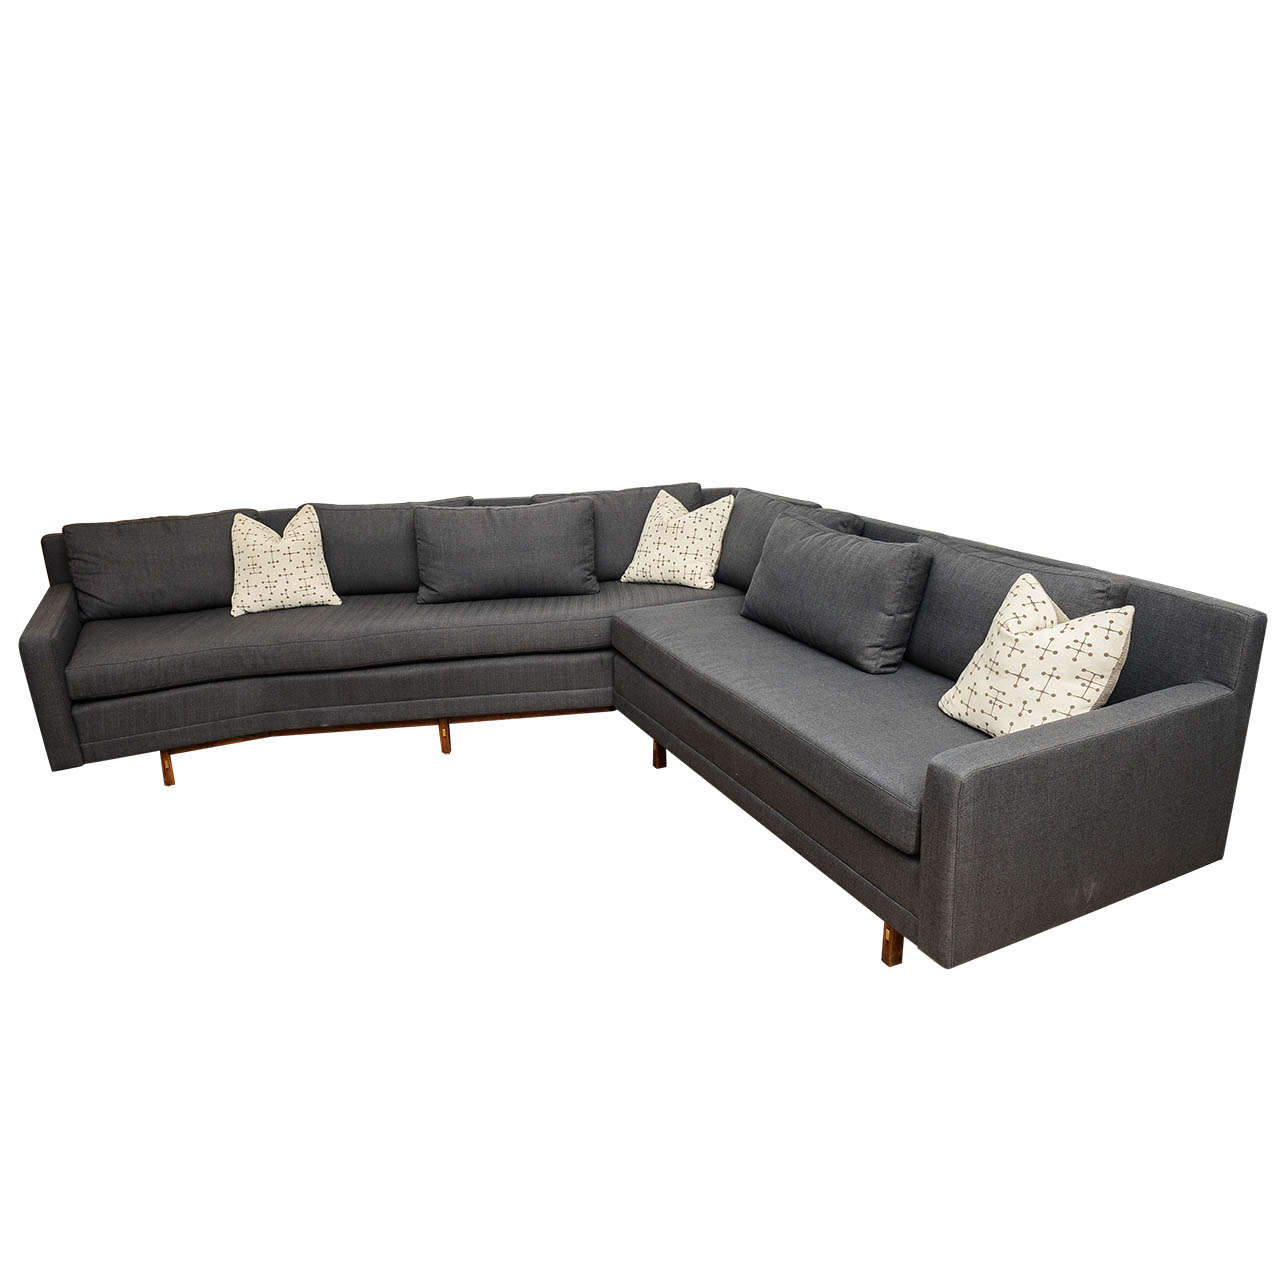 Mid century modern couch for sale - Paul Mccobb Sleek Mid Century Modern Vintage Sectional Sofa 1